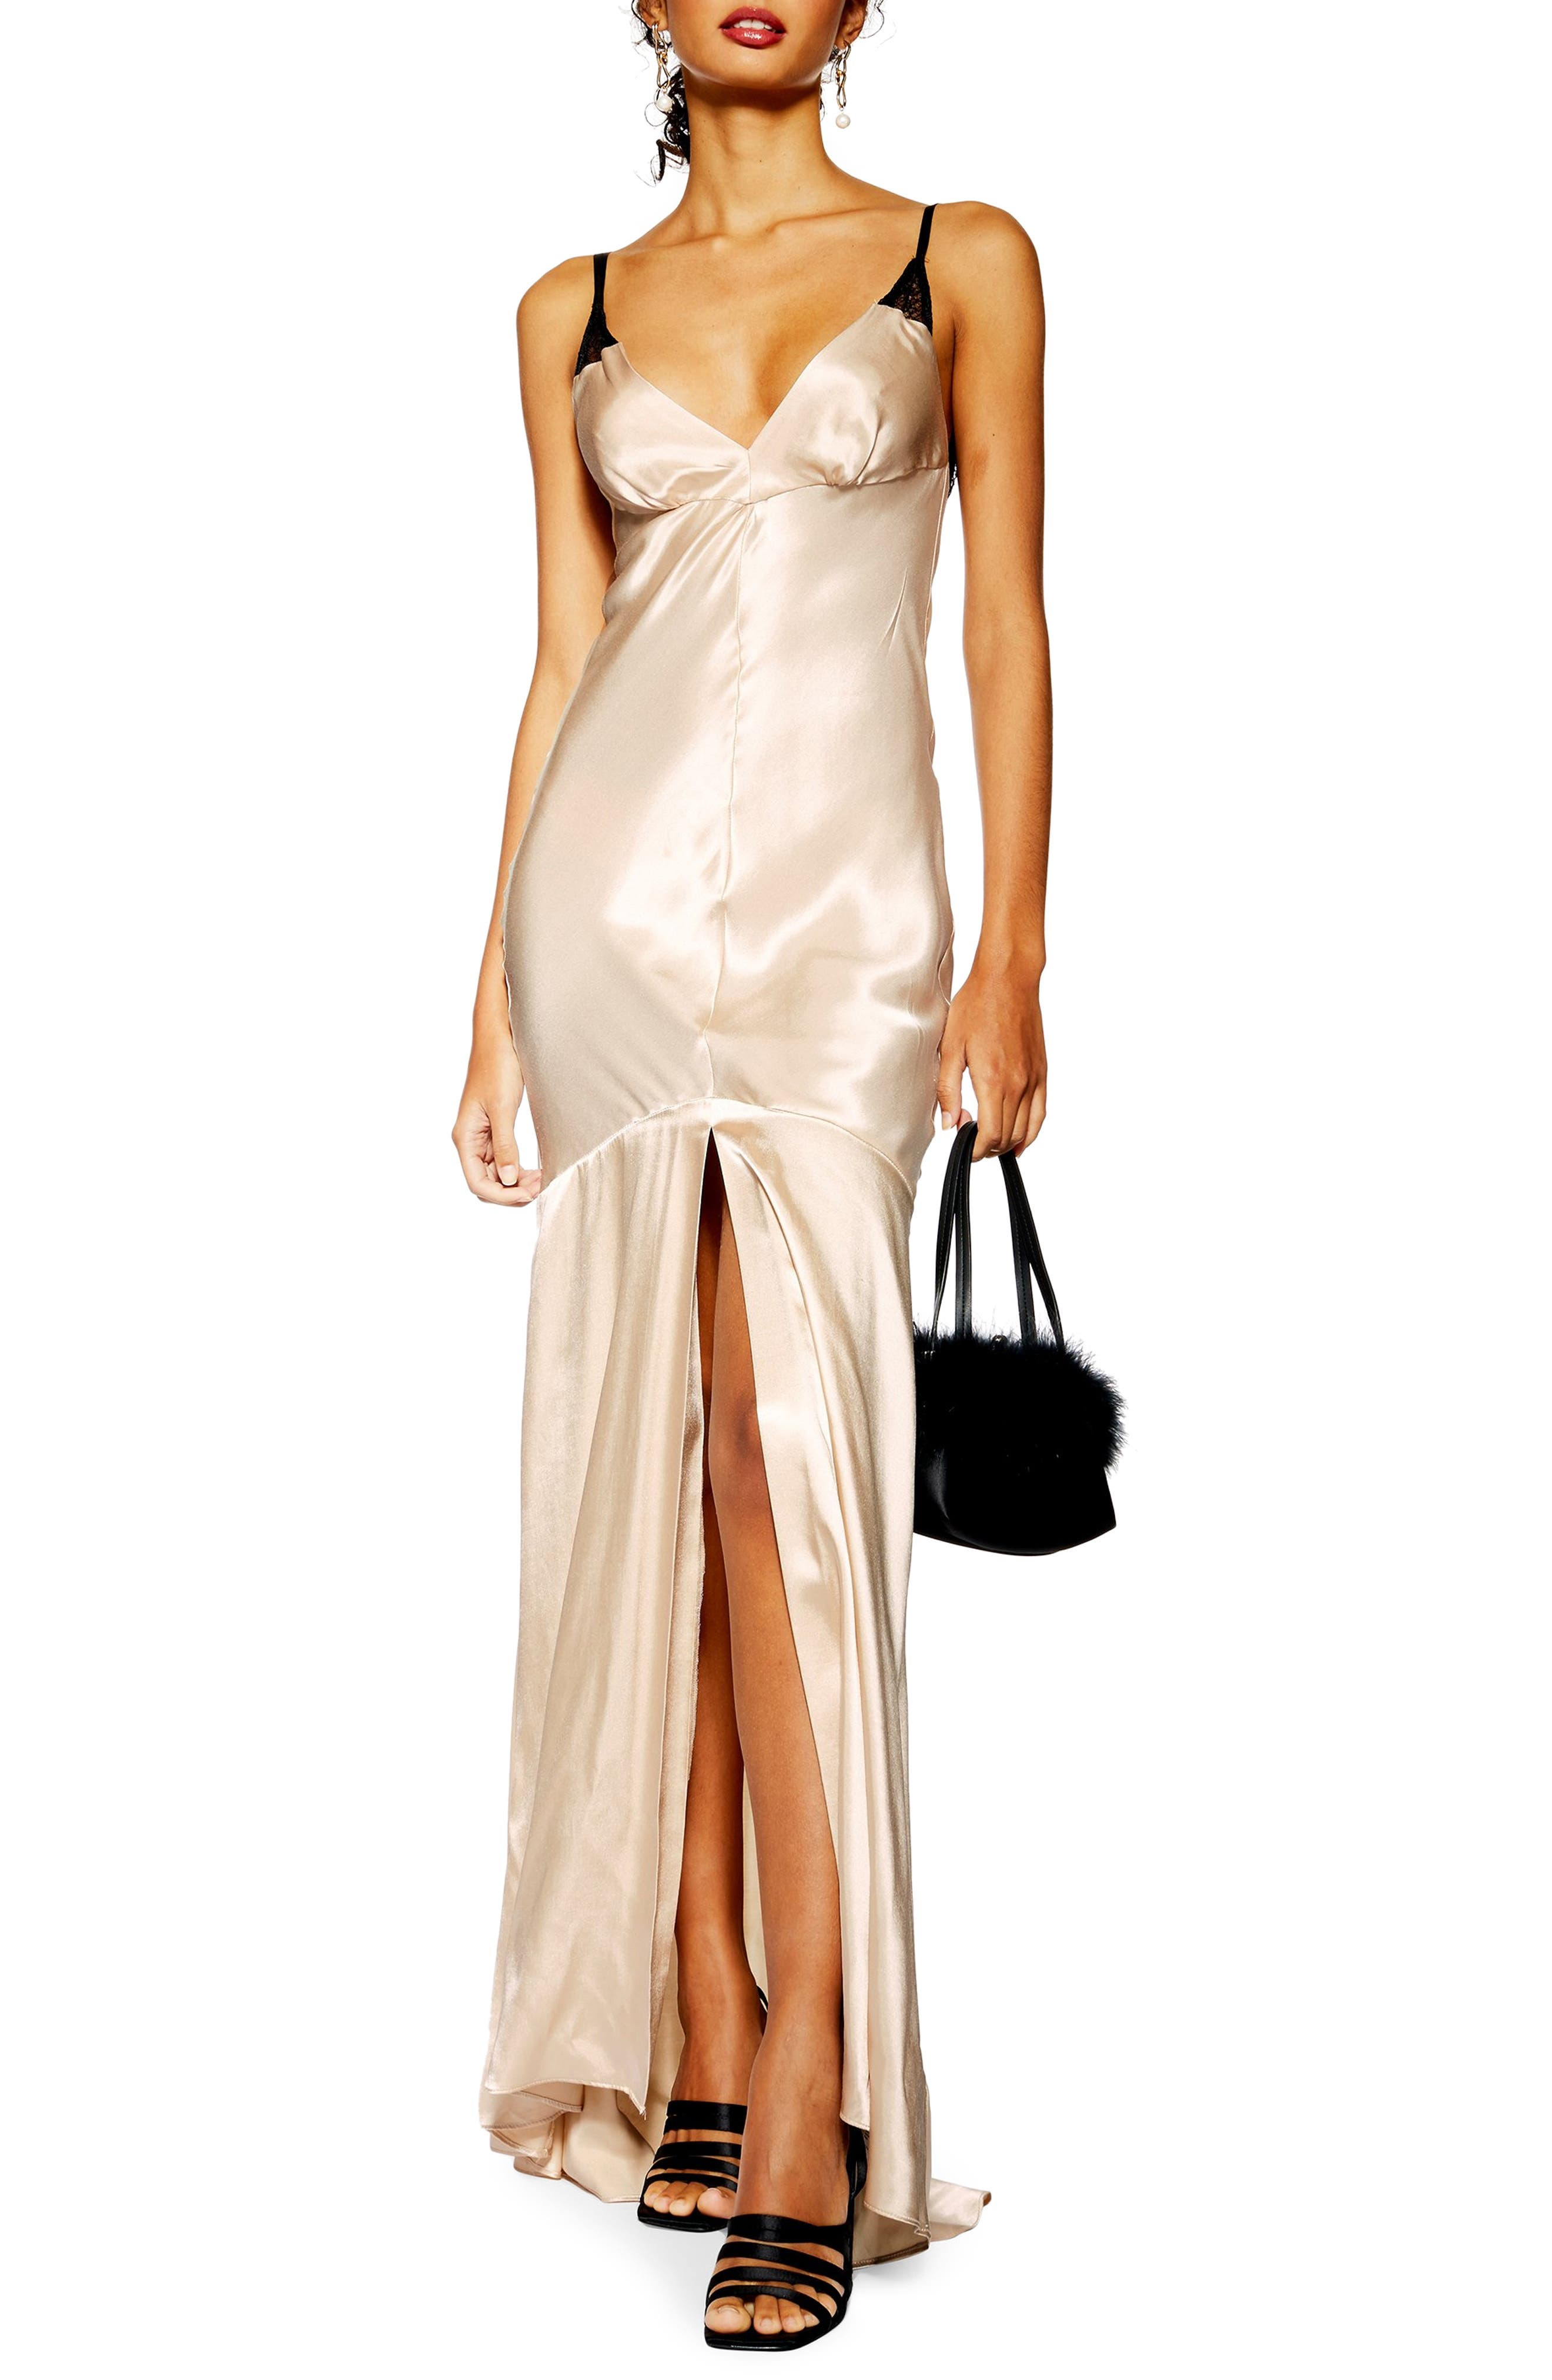 Topshop Lace Satin Maxi Dress, US (fits like 10-12) - Ivory